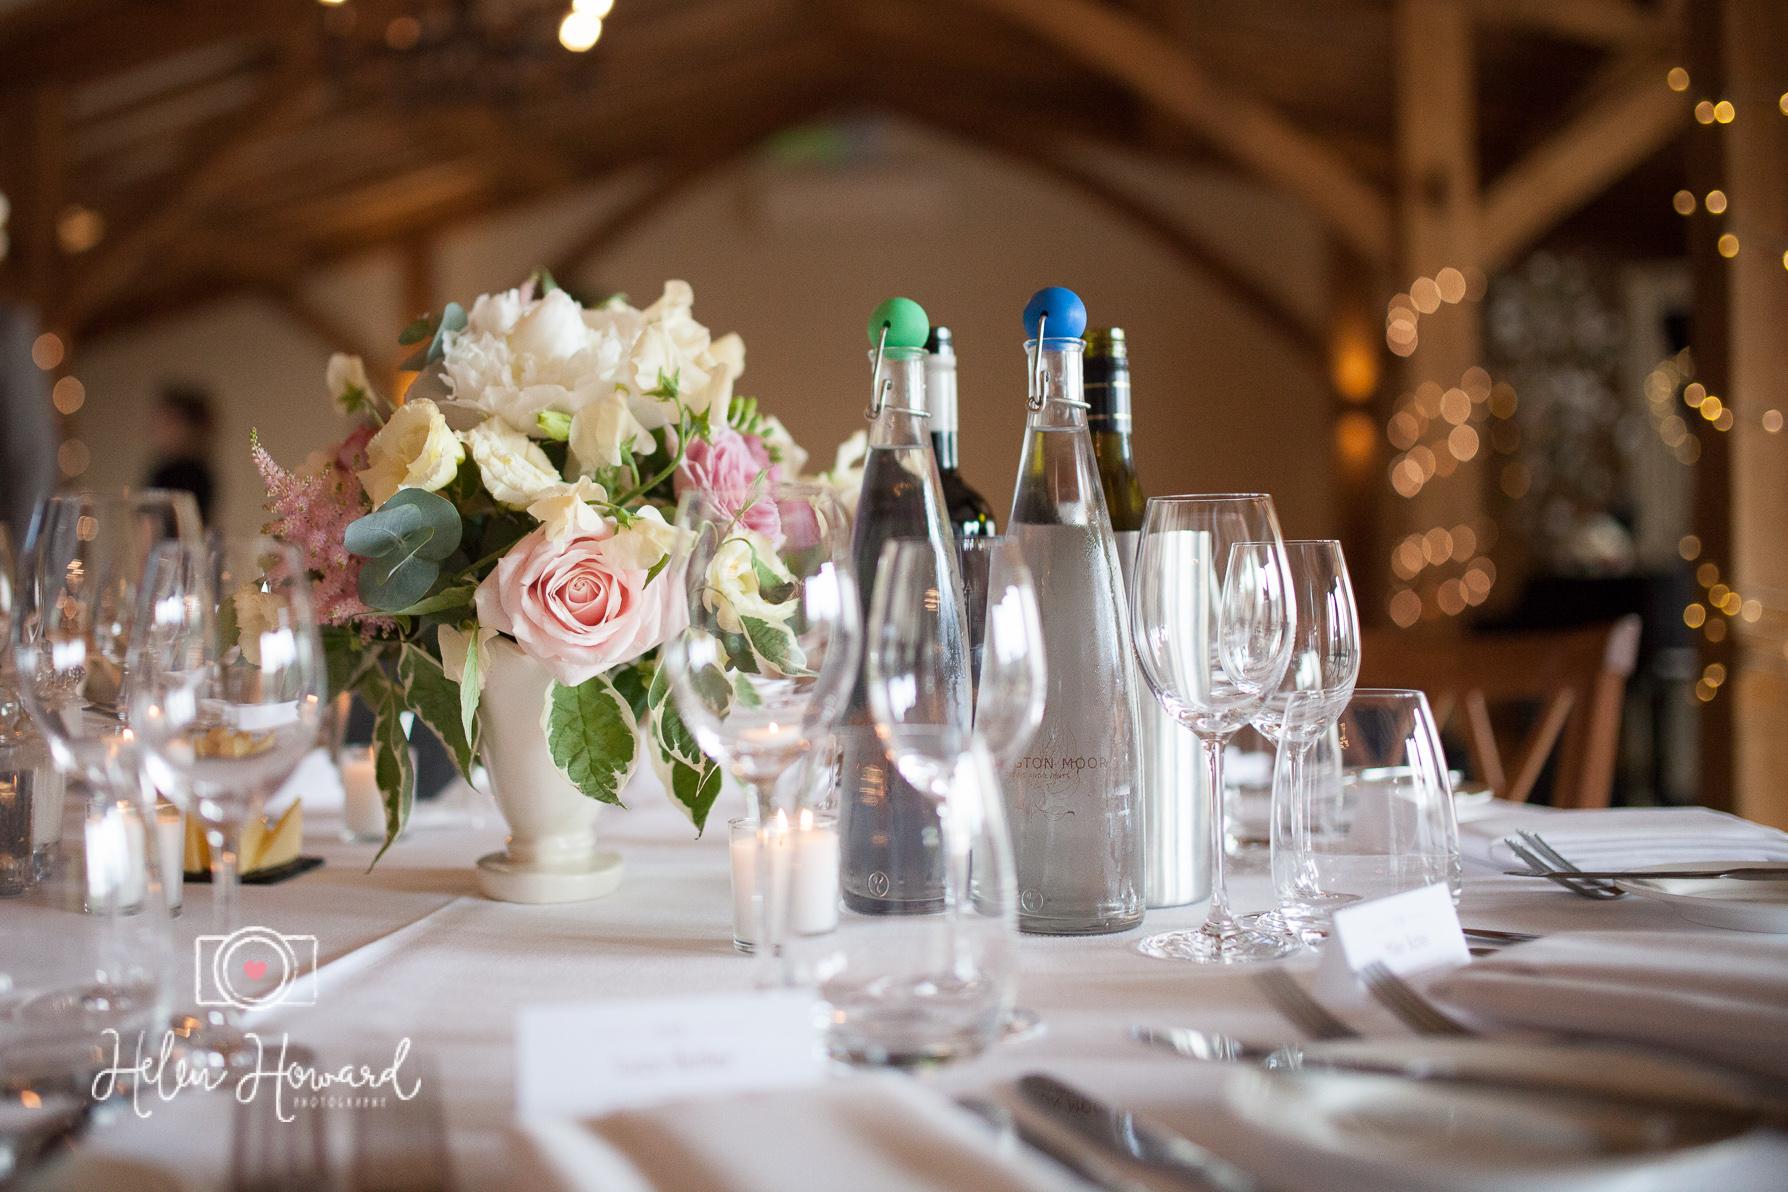 Helen Howard Photography Packington Moor Wedding-87.jpg